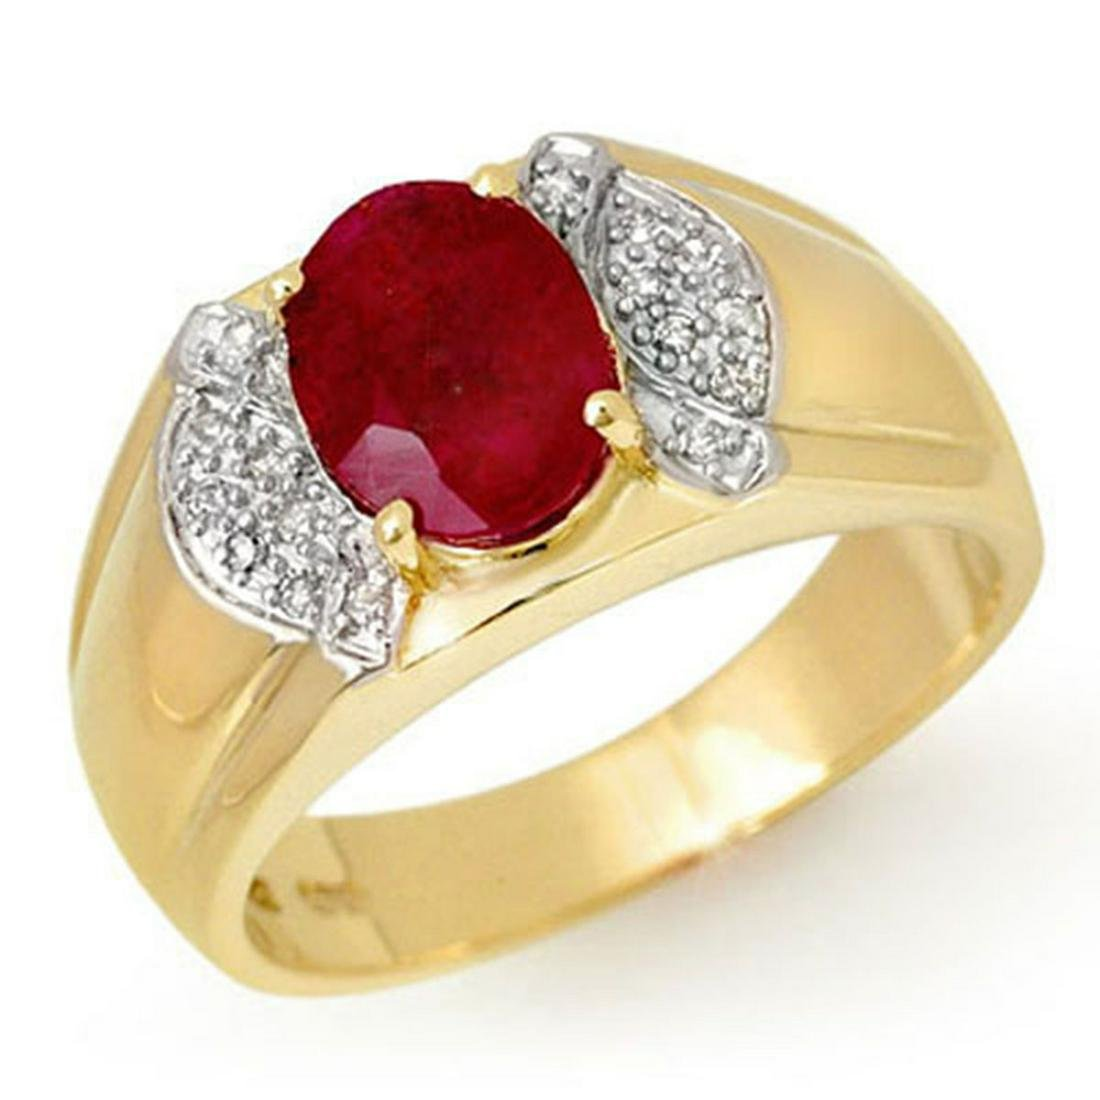 2.75 ctw Ruby & Diamond Men's Ring 10K Yellow Gold